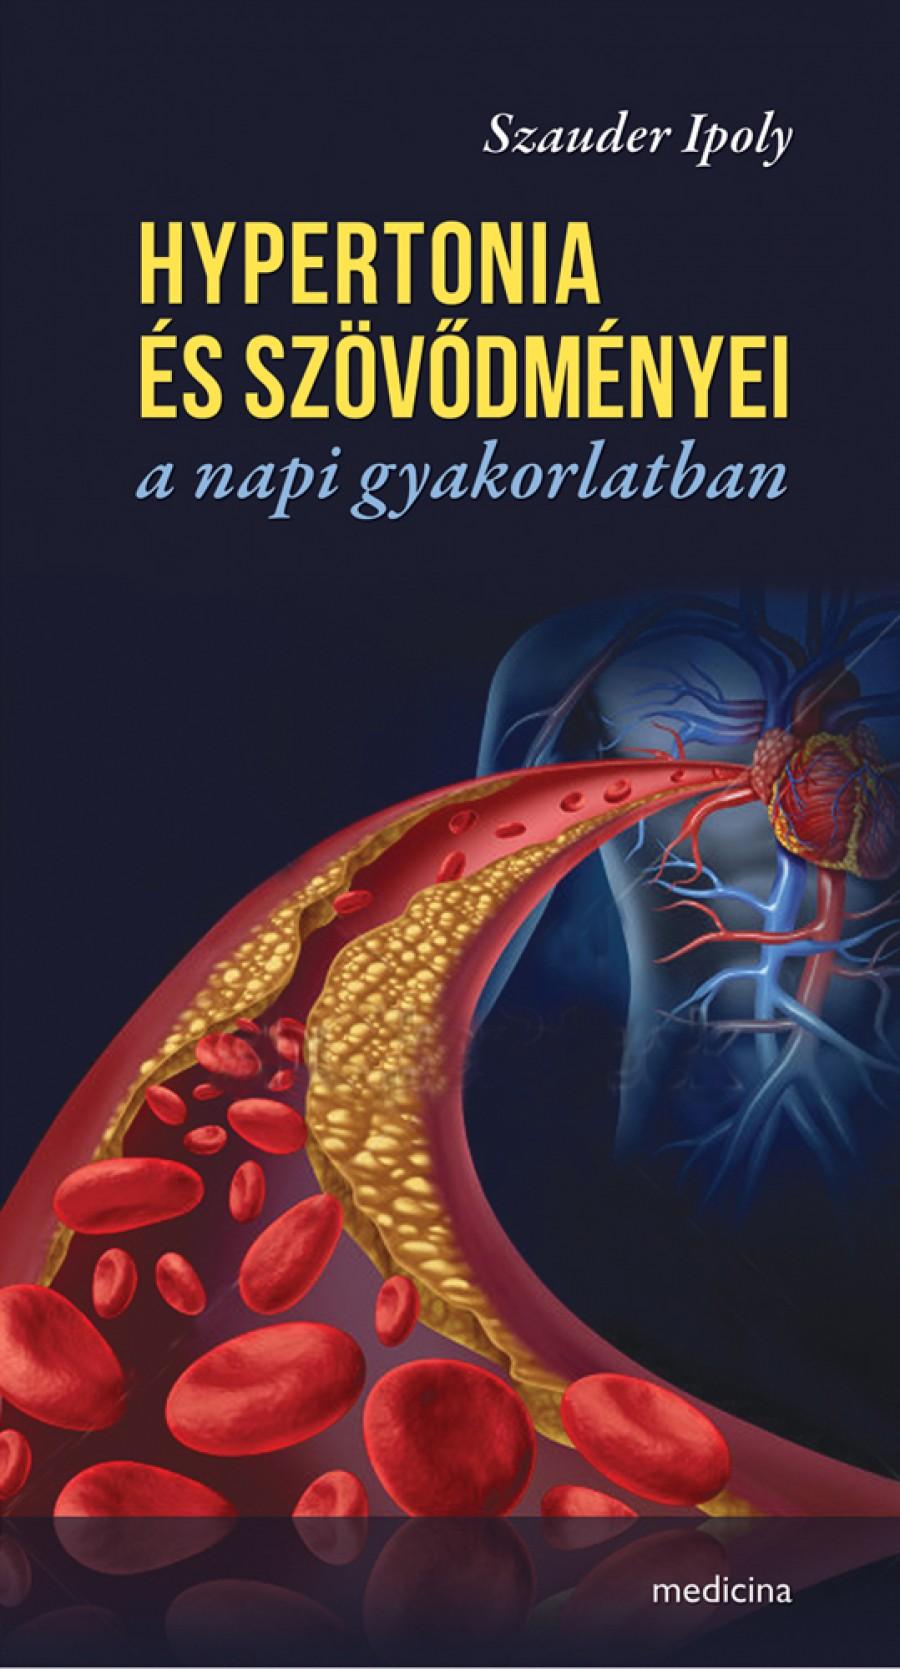 ascorutin és magas vérnyomás magas vérnyomás tinktúra